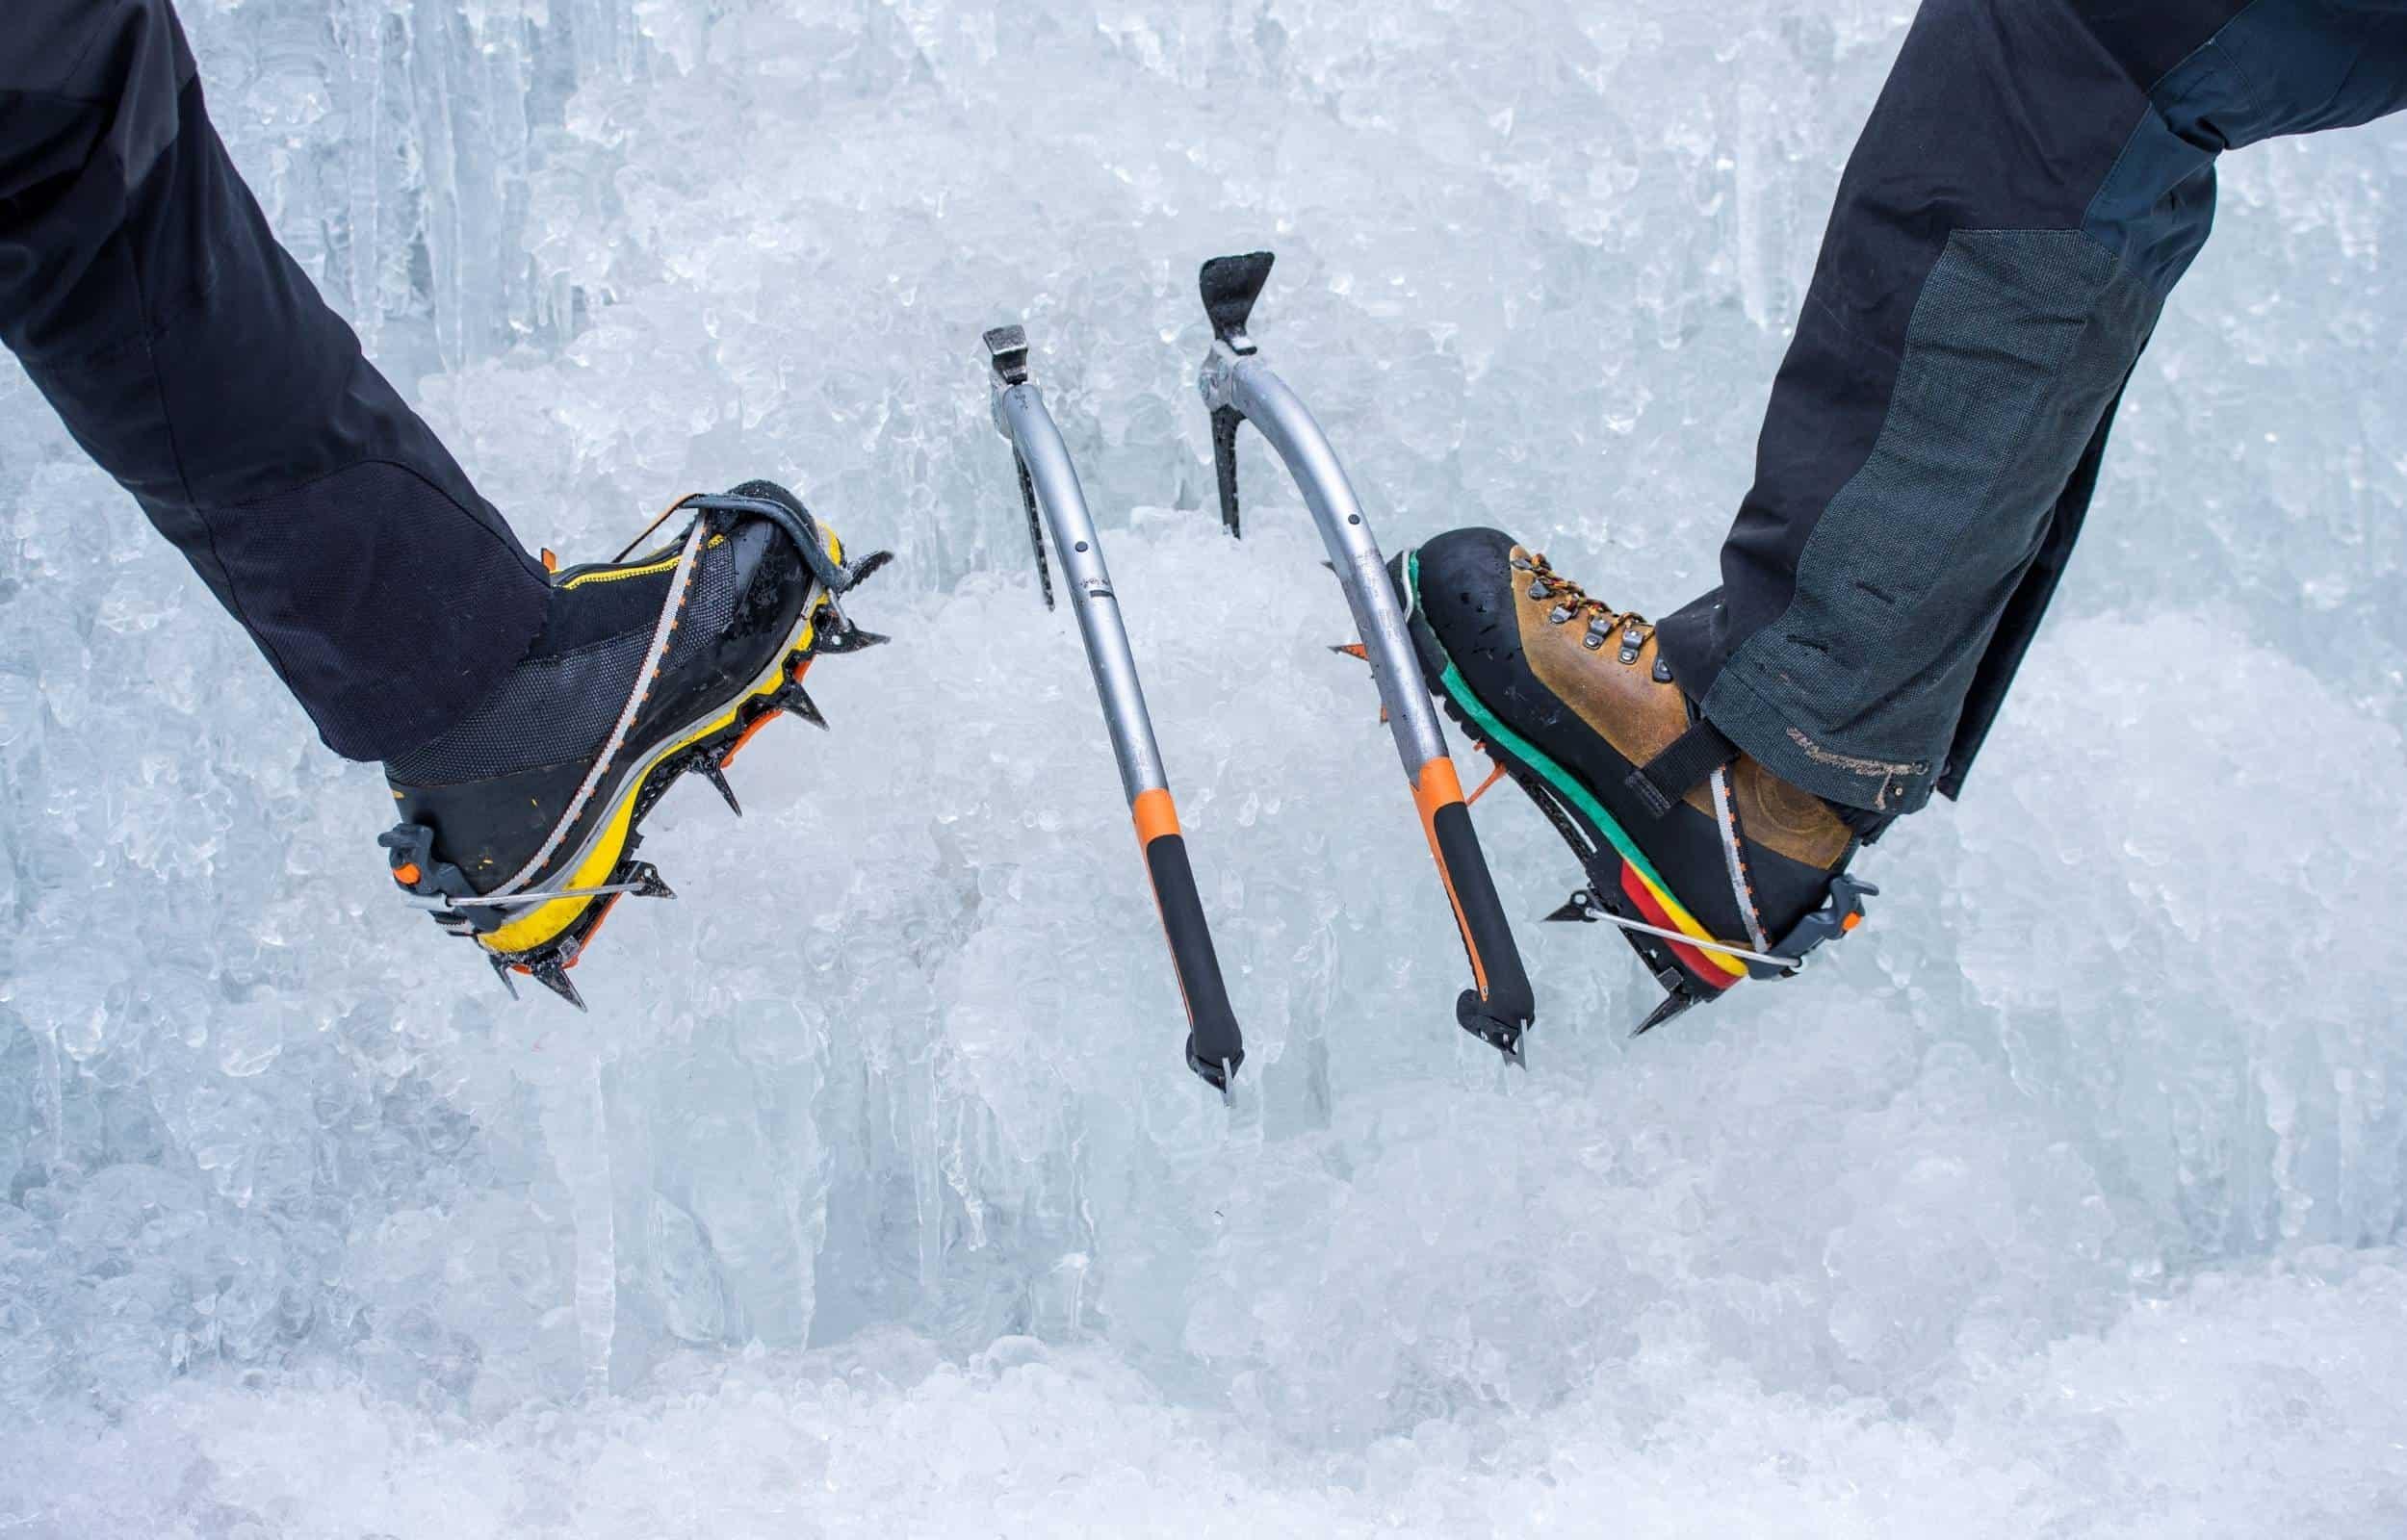 ice climbing gear boots